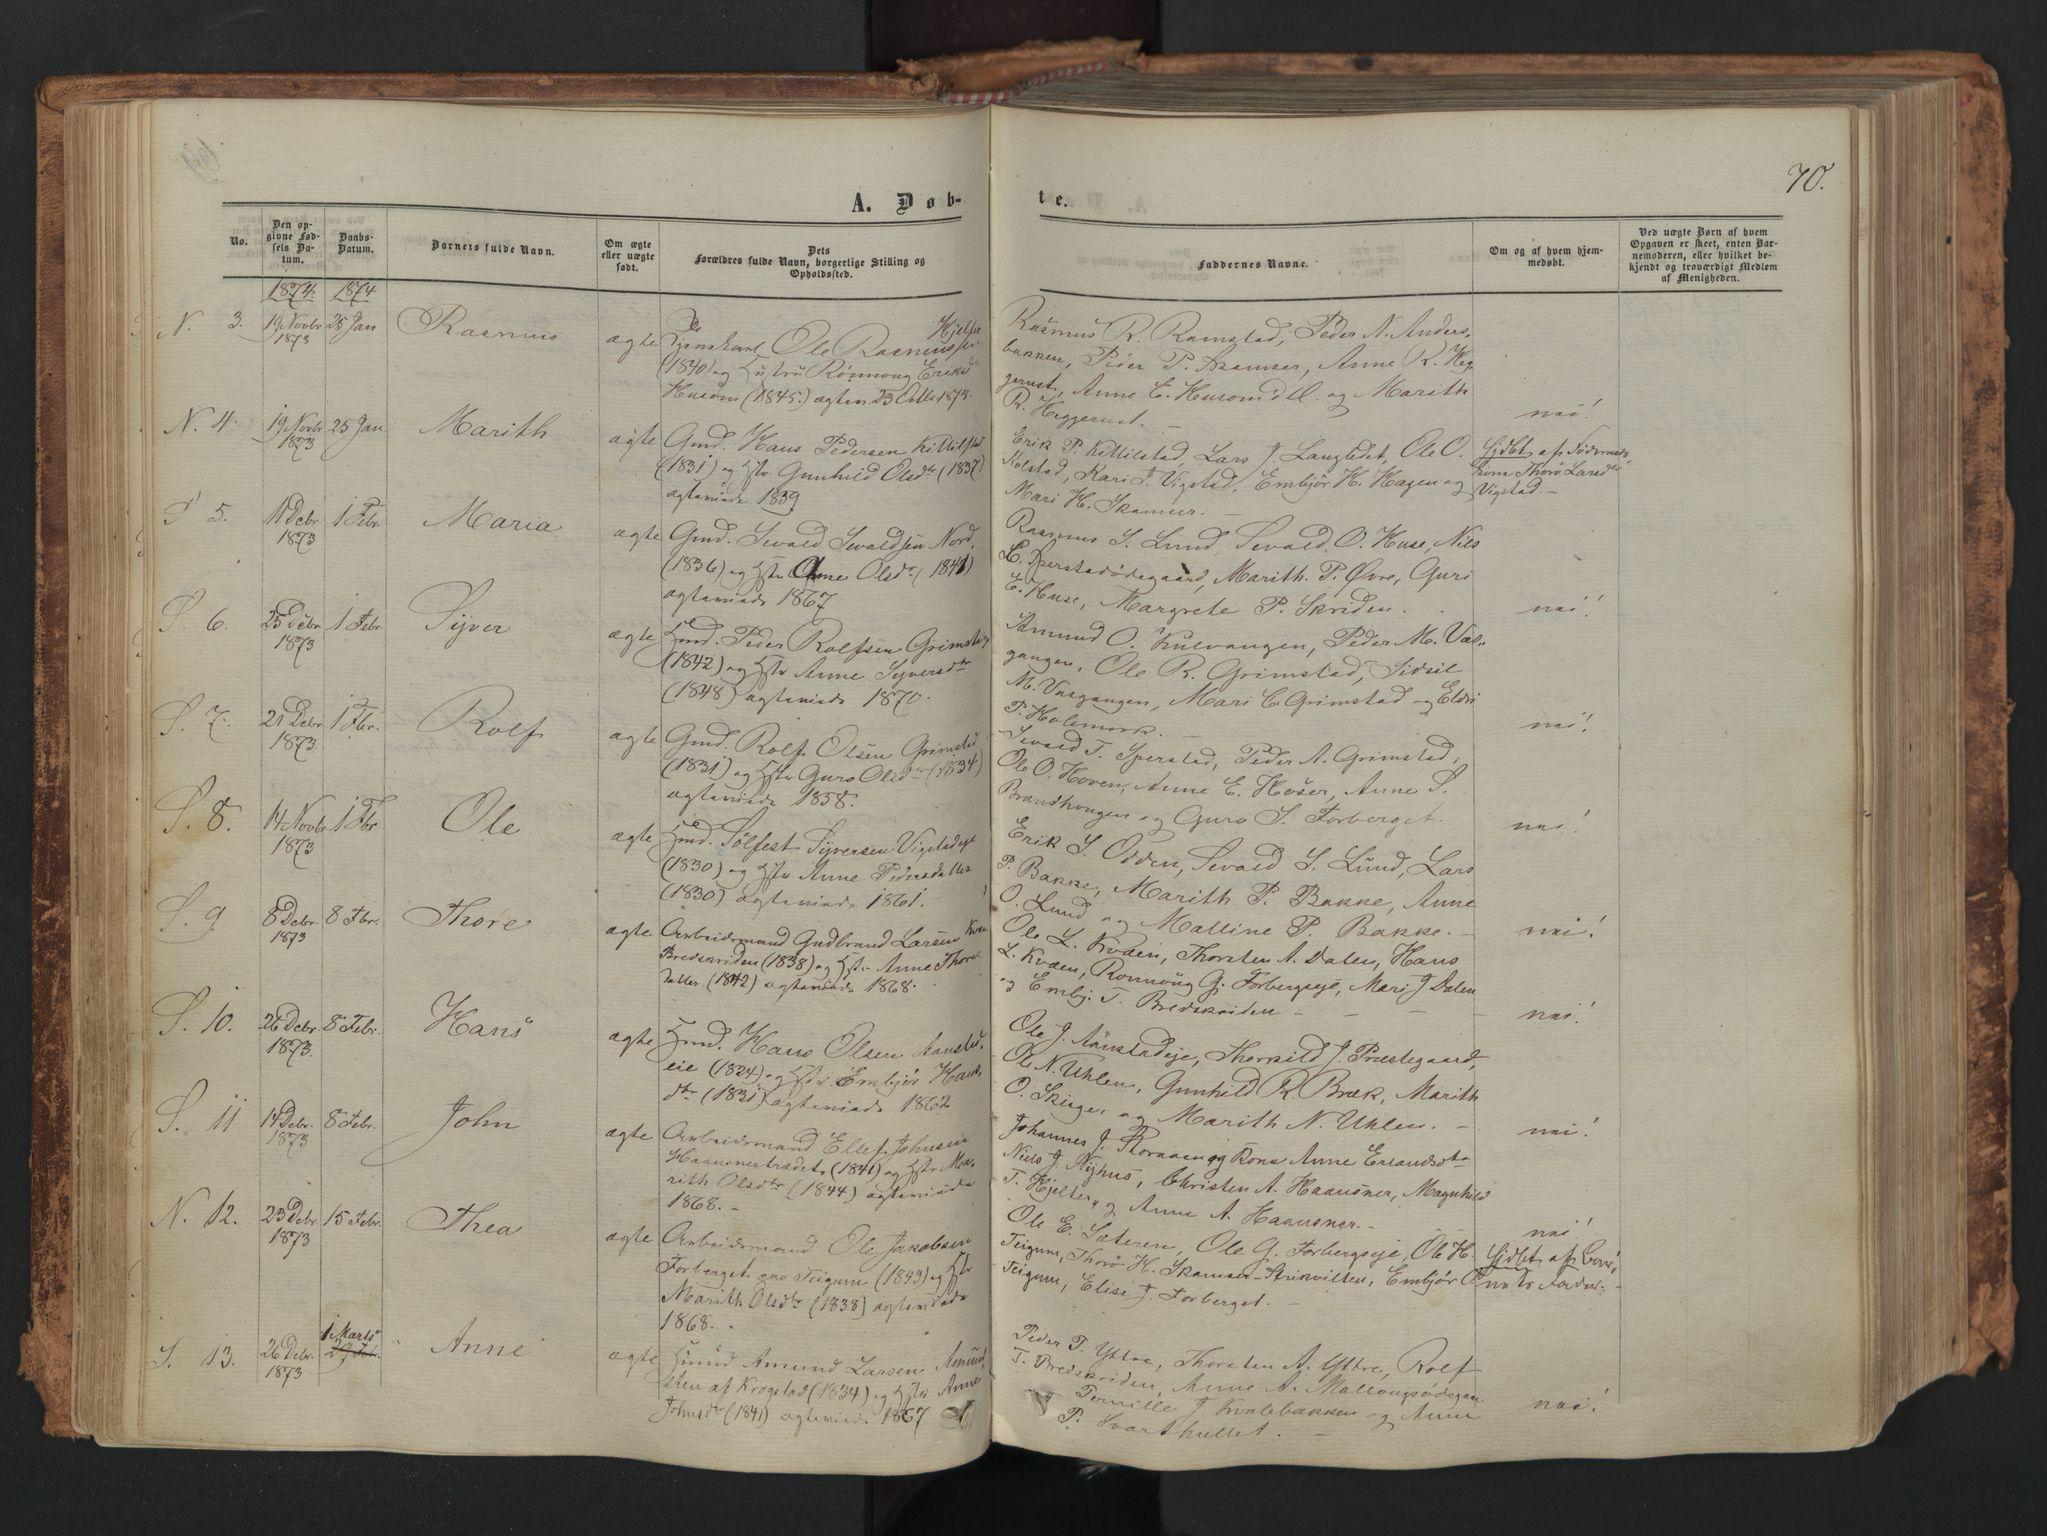 SAH, Skjåk prestekontor, Ministerialbok nr. 1, 1863-1879, s. 70